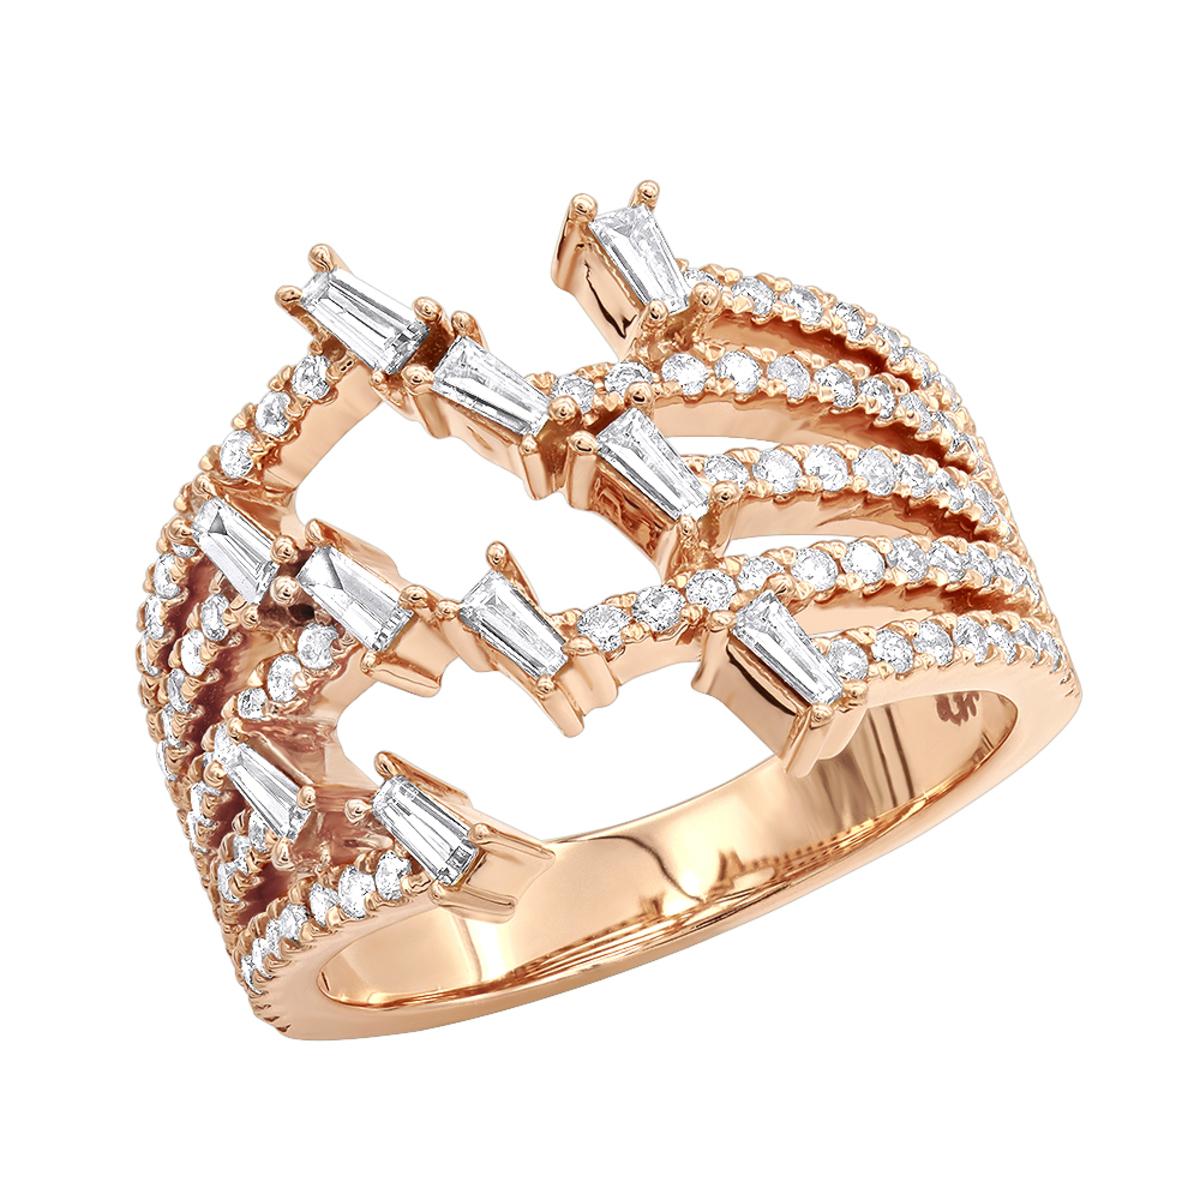 1.1 Carat Designer Diamond Right Hand Ring for Women by Luxurman 14k Gold